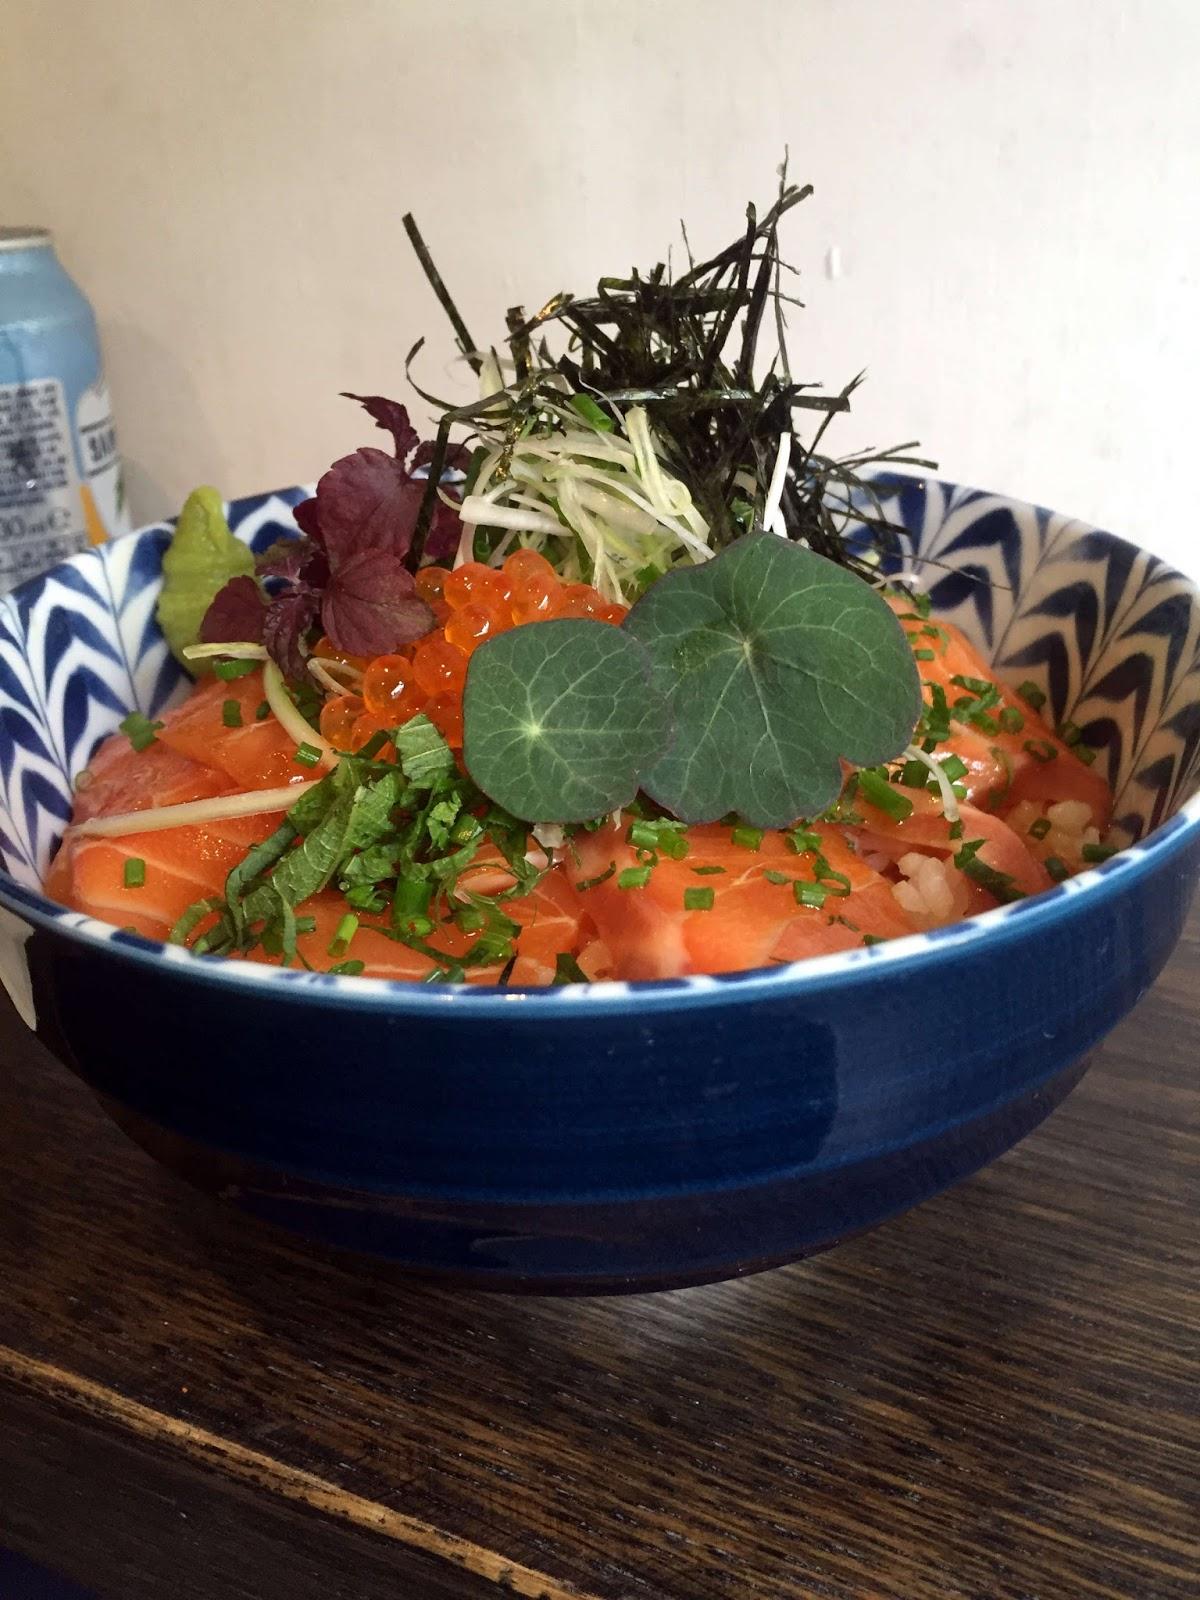 Stitch and Bear - Miyazaki - Salmon zuke donburi